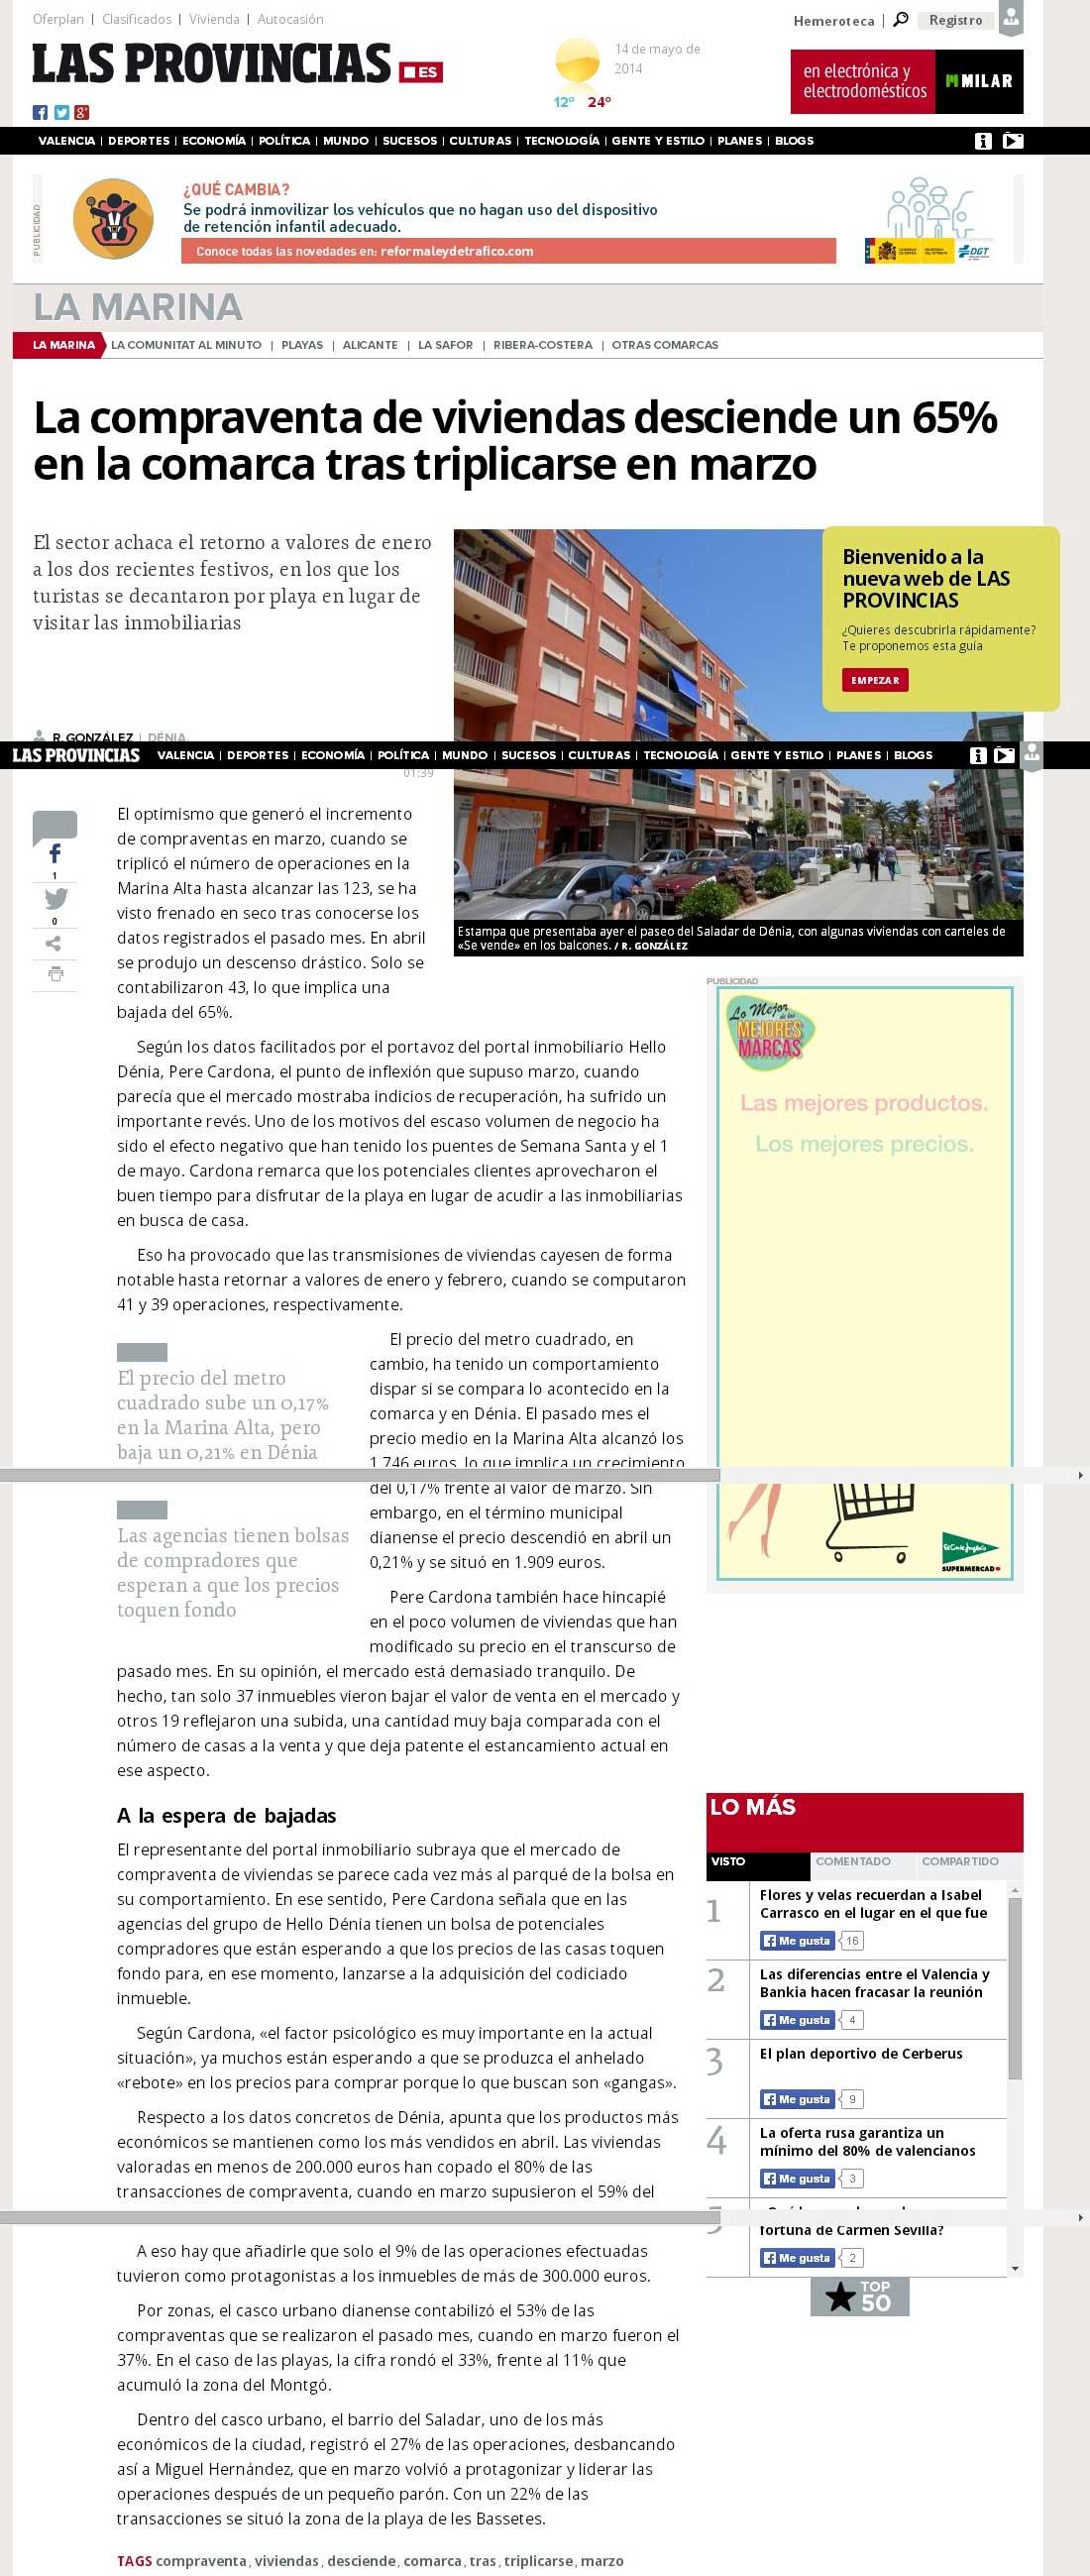 Las Provincias - Informe Abril Hellodenia